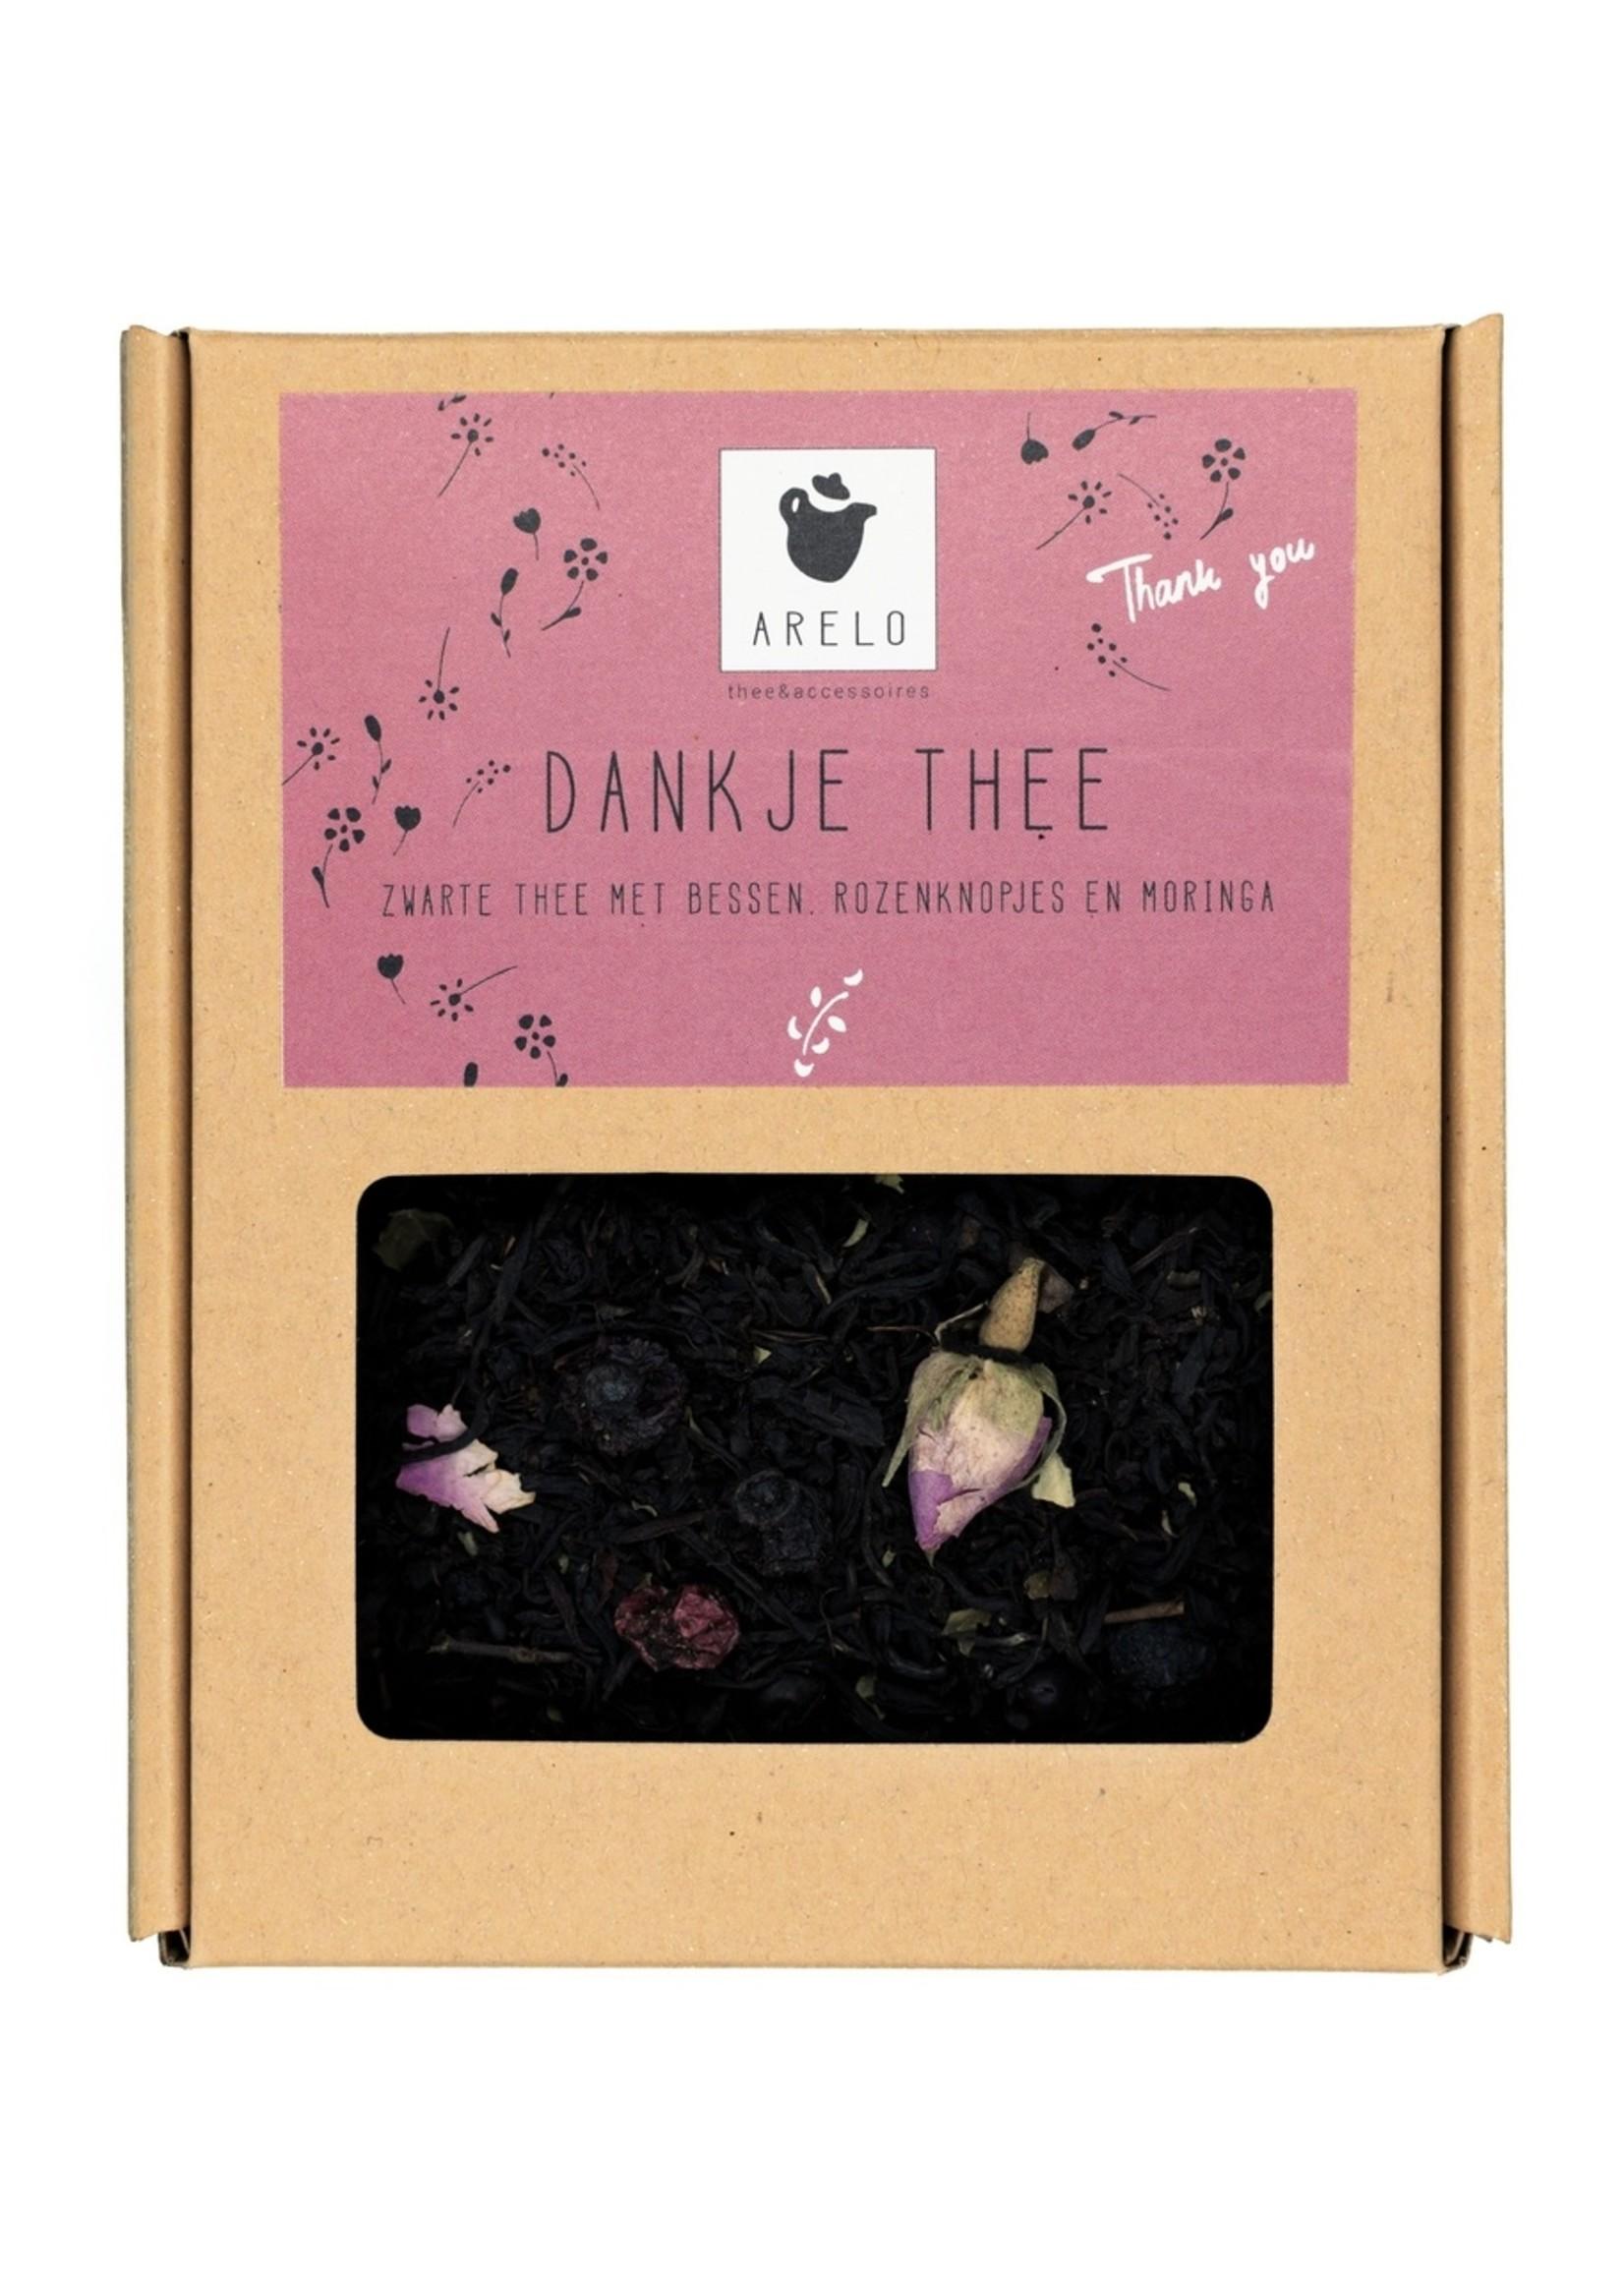 Arelo Thee Arelo - Dank je Thee - Zwarte Thee, bessen, rozenknopjes, moringa